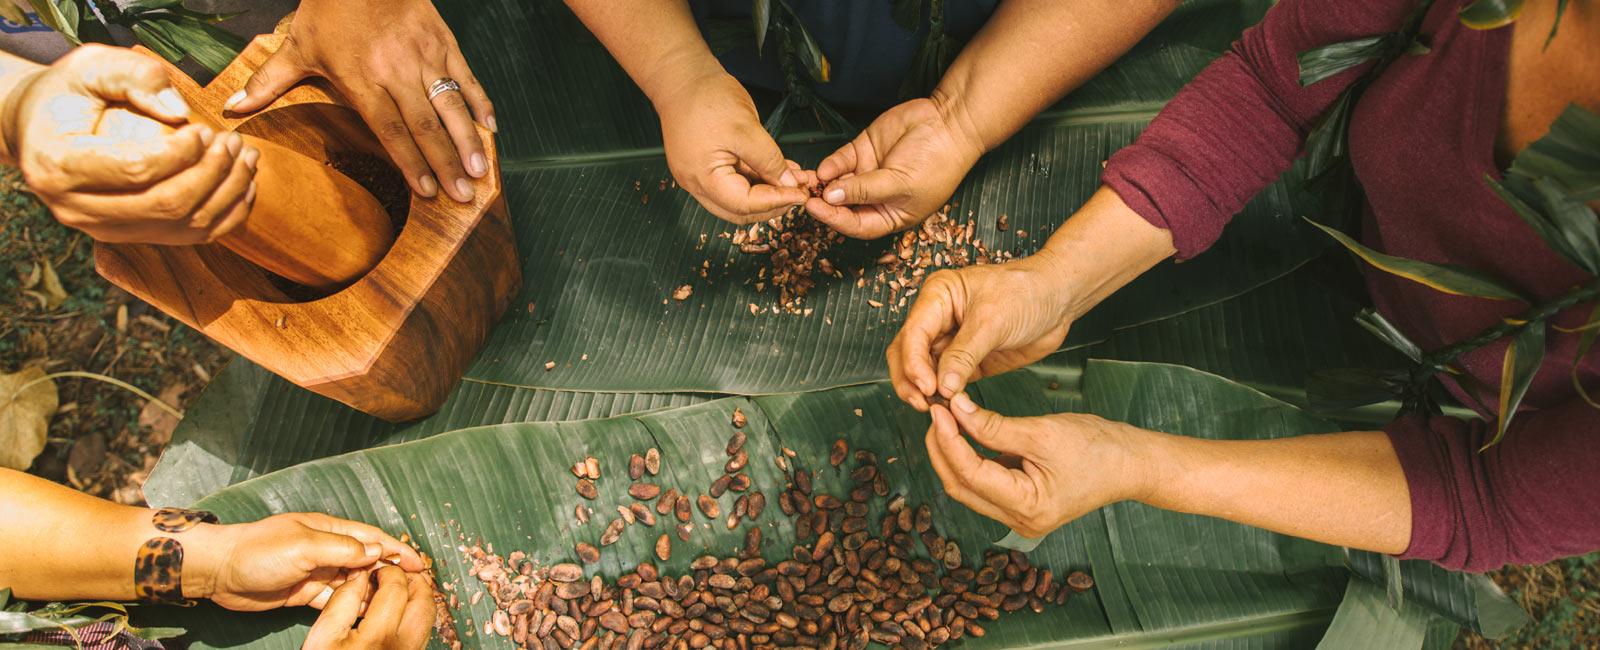 The Bittersweet Life of an Organic Cocoa Farmer in Samoa (Part 2)